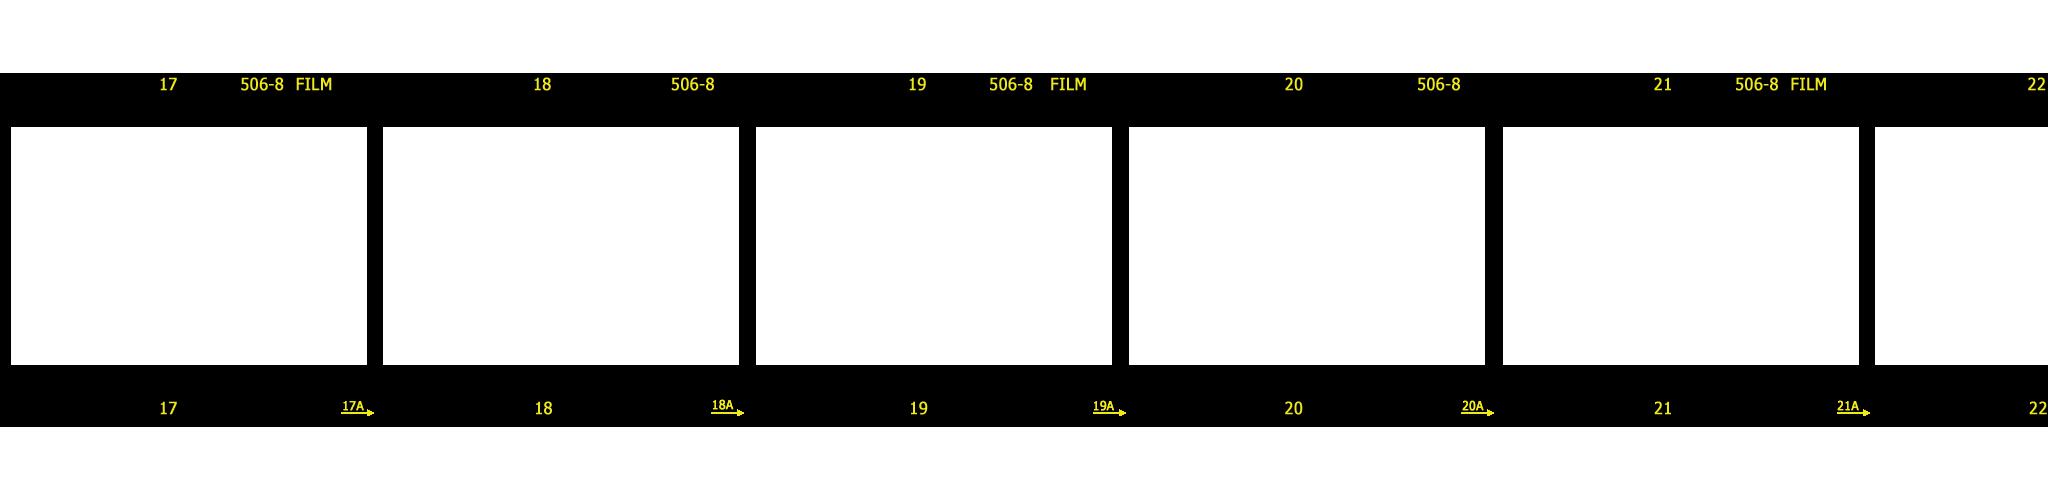 Film clipart vector. Filmstrip transparent png pictures